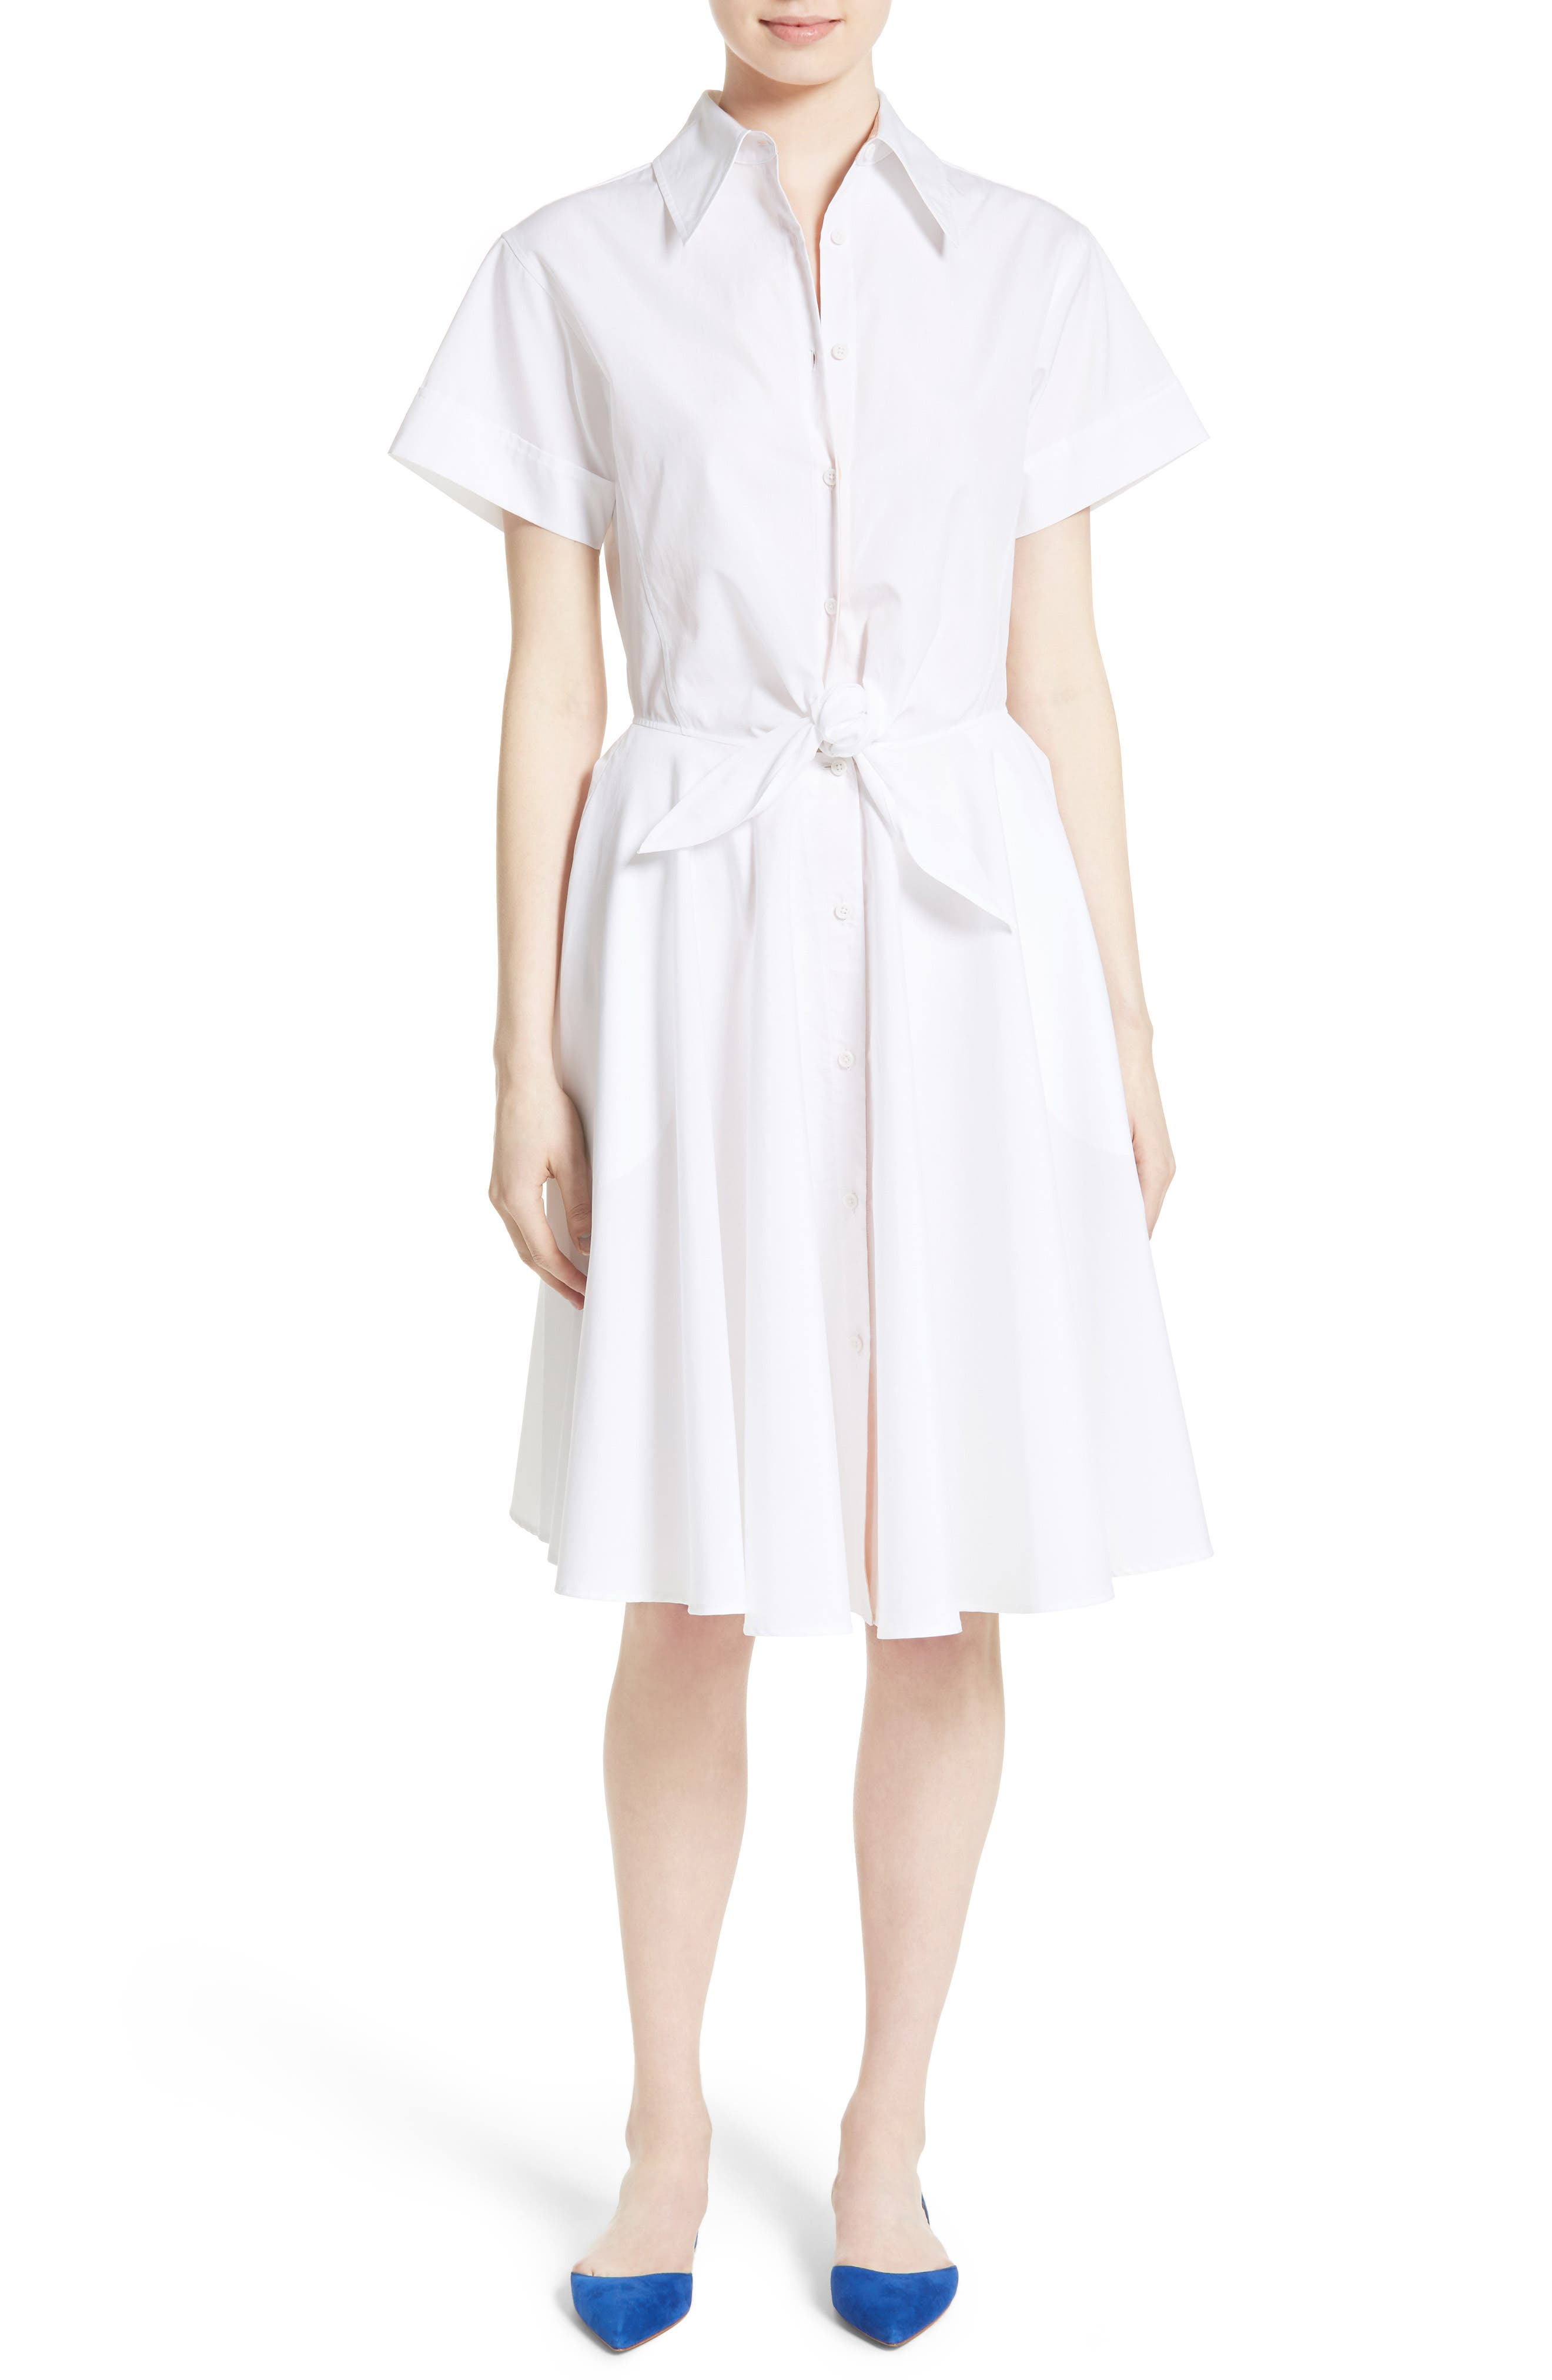 Alternate Image 1 Selected - Diane von Furstenberg Cotton Shirtdress